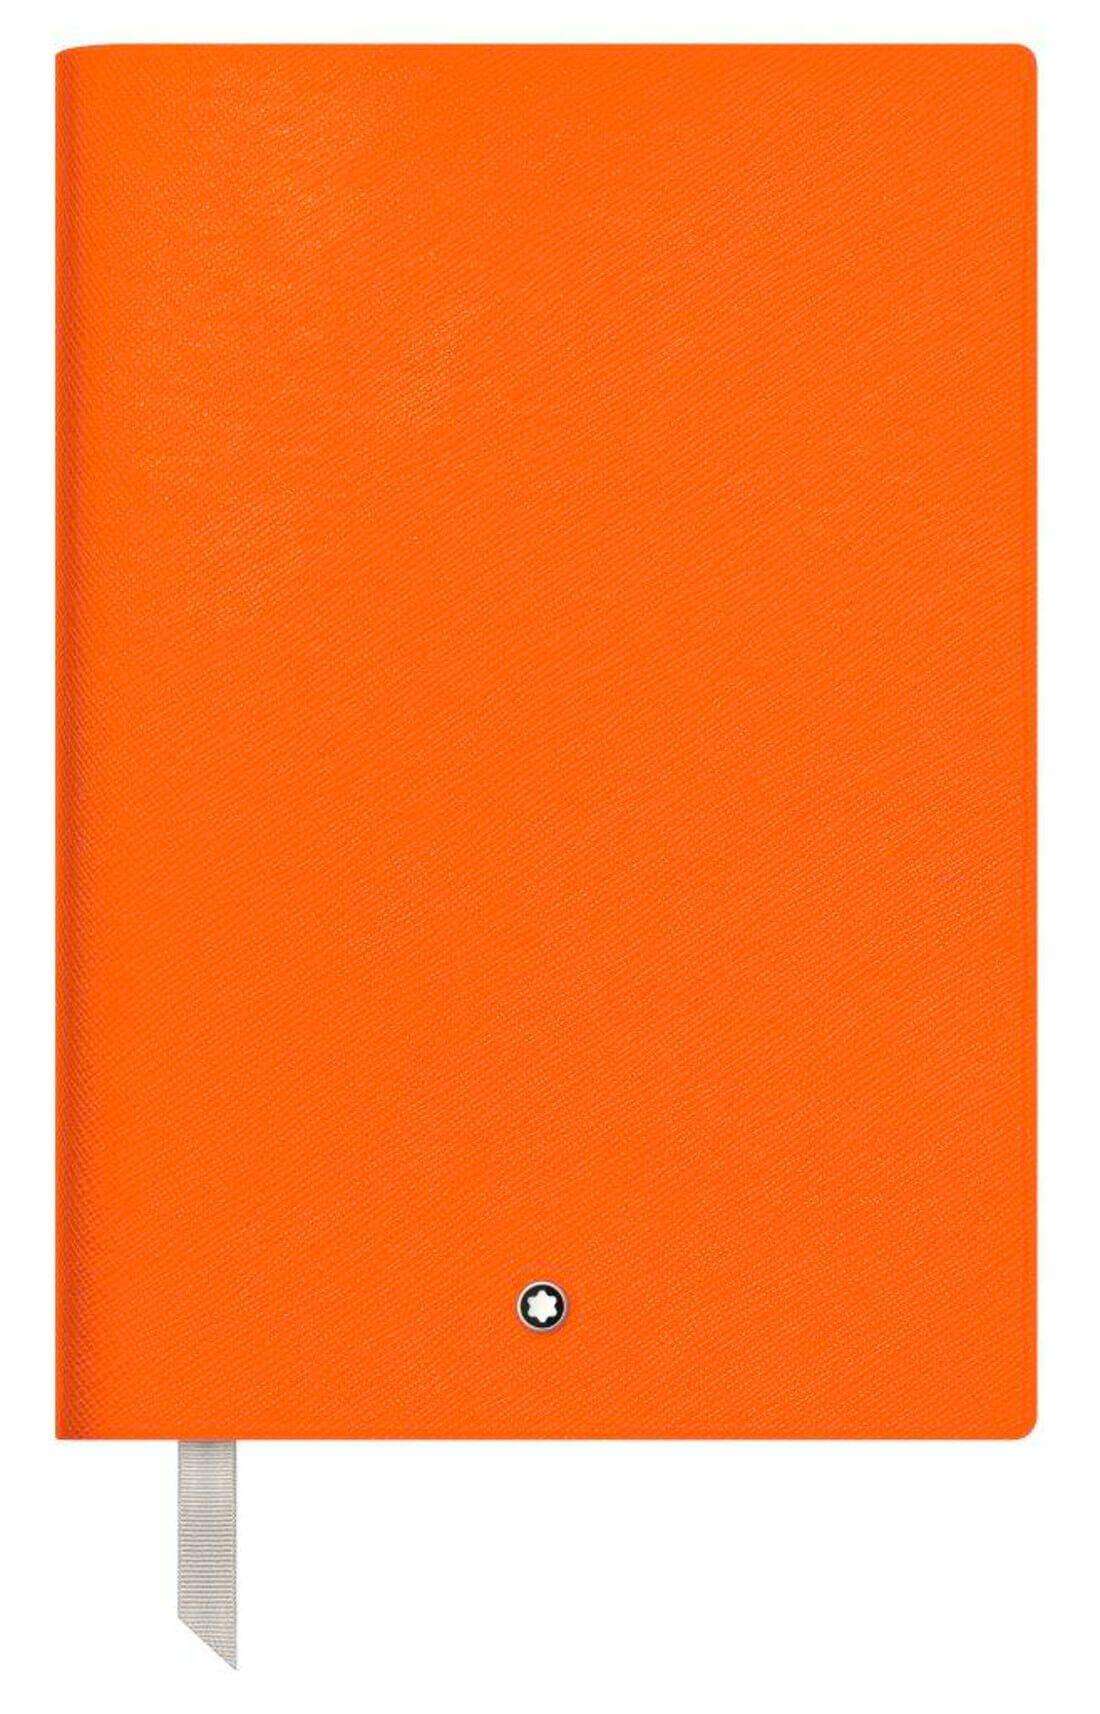 montblanc-fine-stationery-notebook-146-lucky-orange-116225